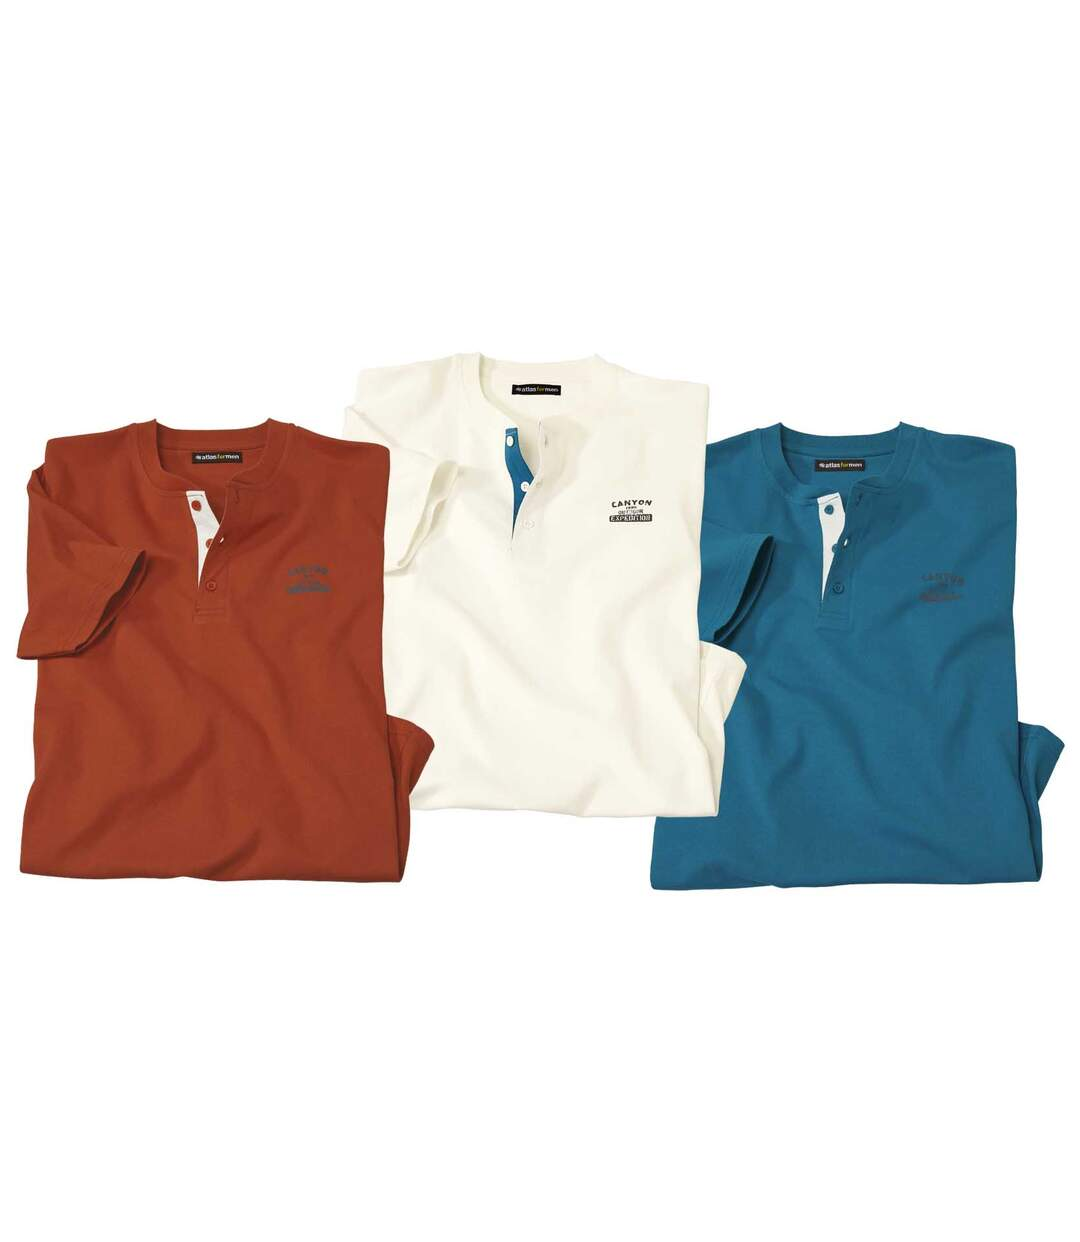 Sada 3 triček Atlas® s knoflíčkovým zapínáním u krku